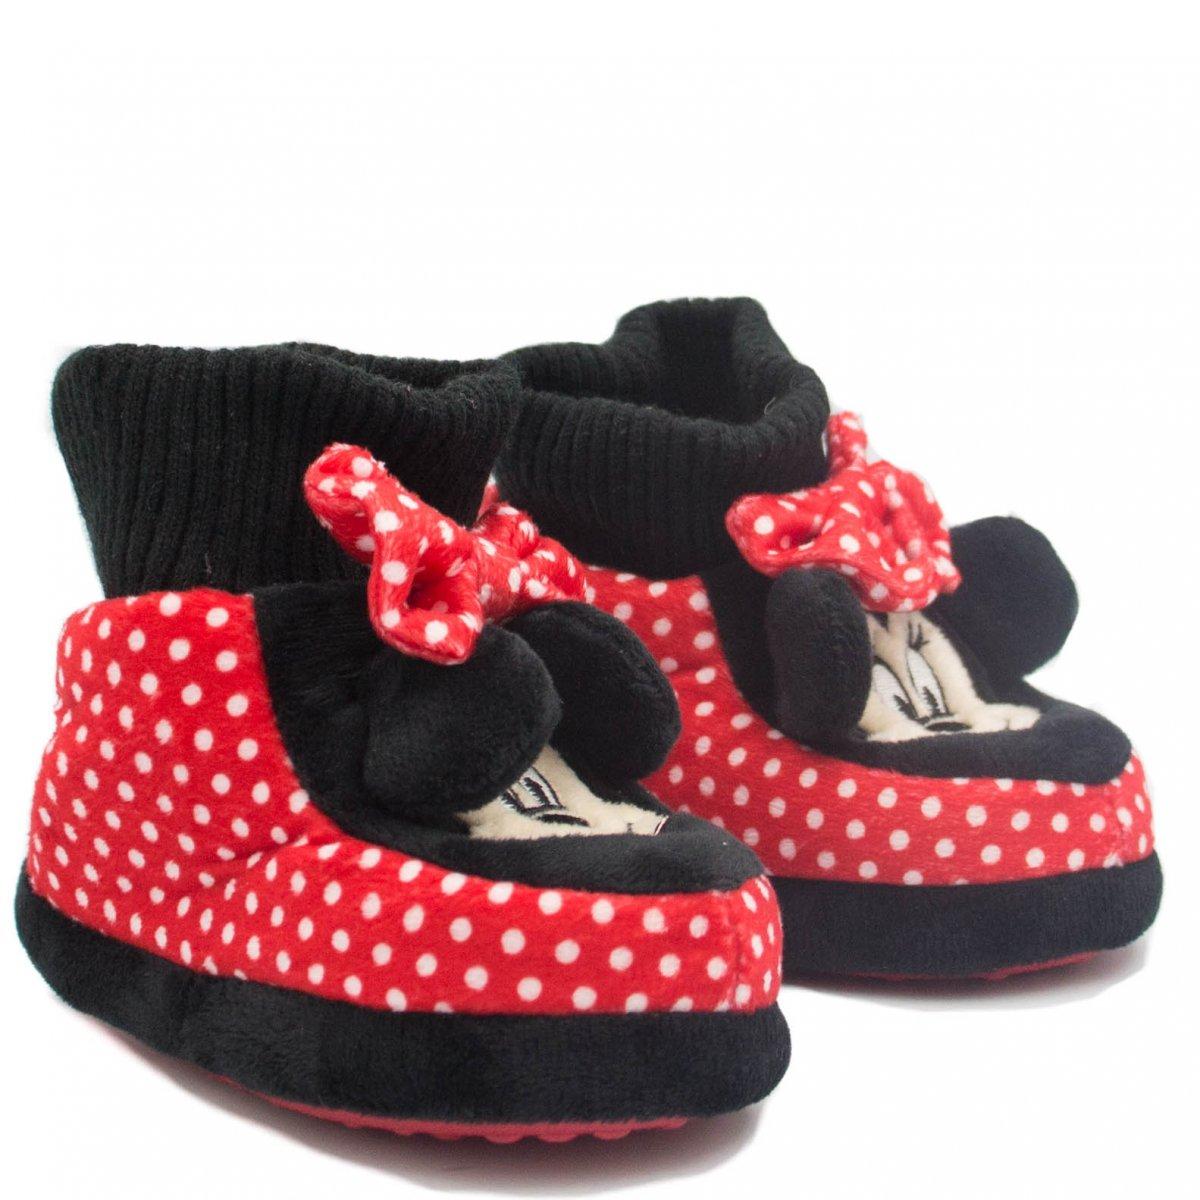 bccb845dd Pantufa Flat Ricsen Minnie Mouse 12051RC | Betisa